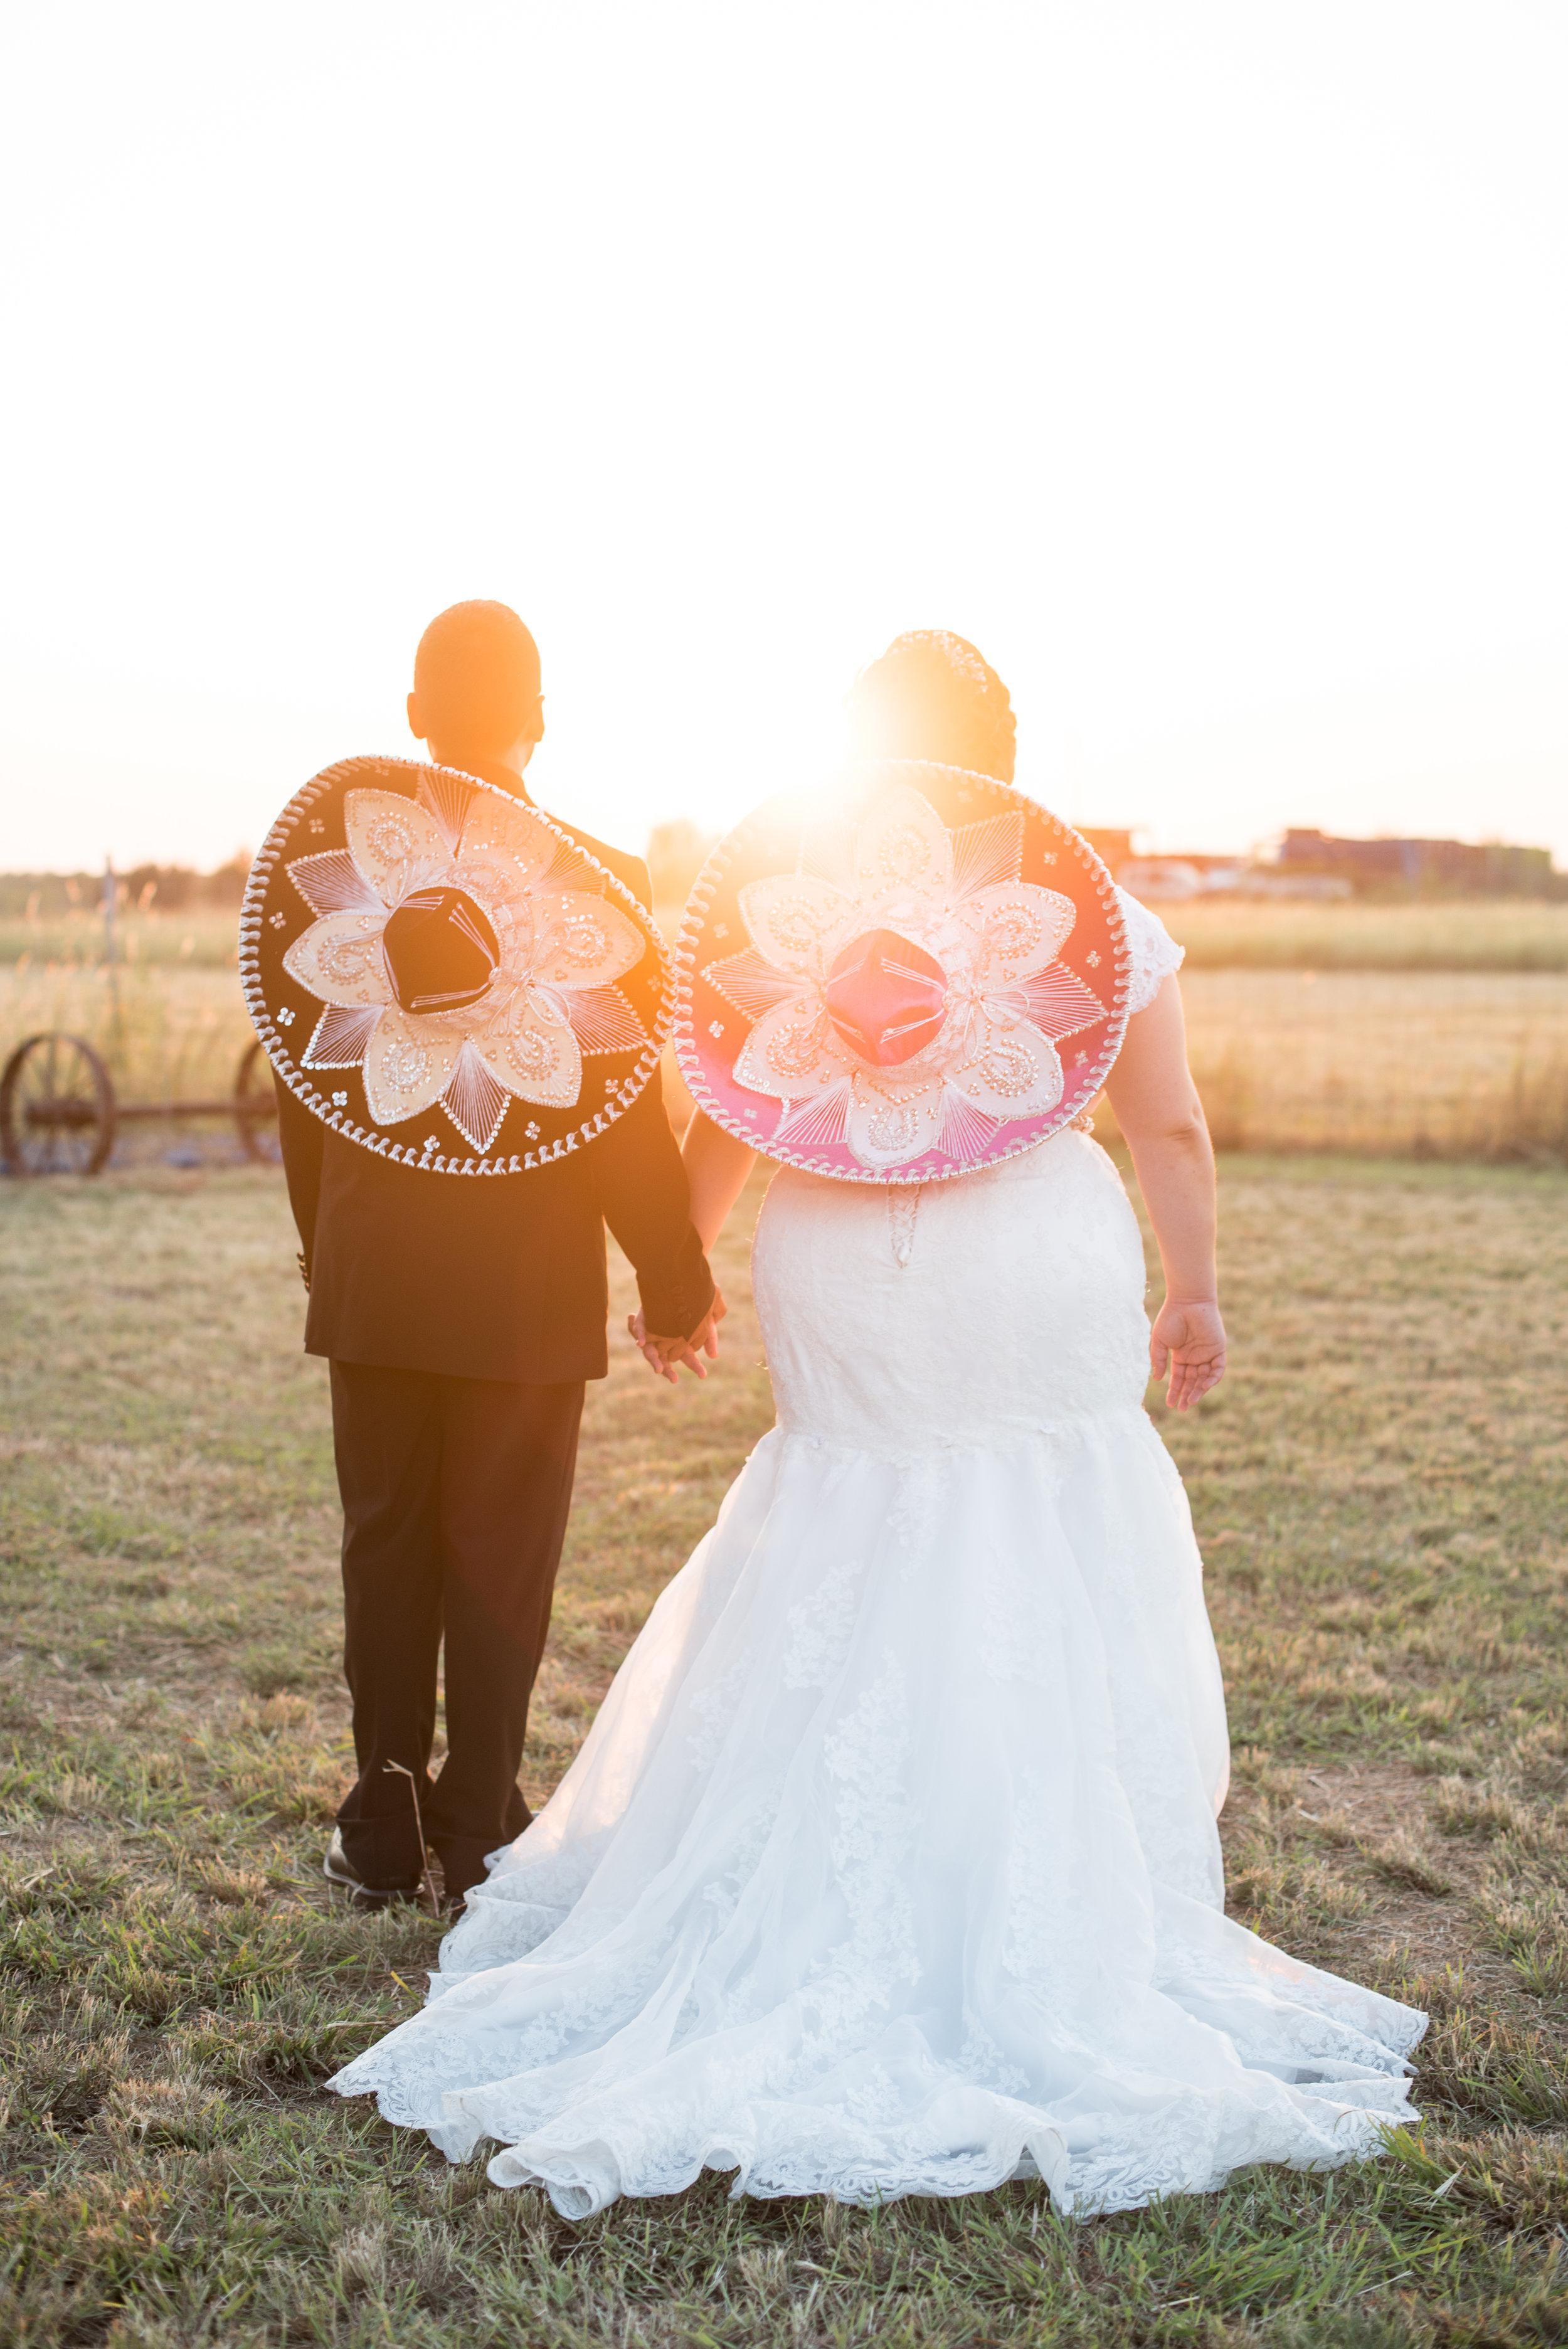 Leal Wedding Mira Visu Photography-1026.jpg